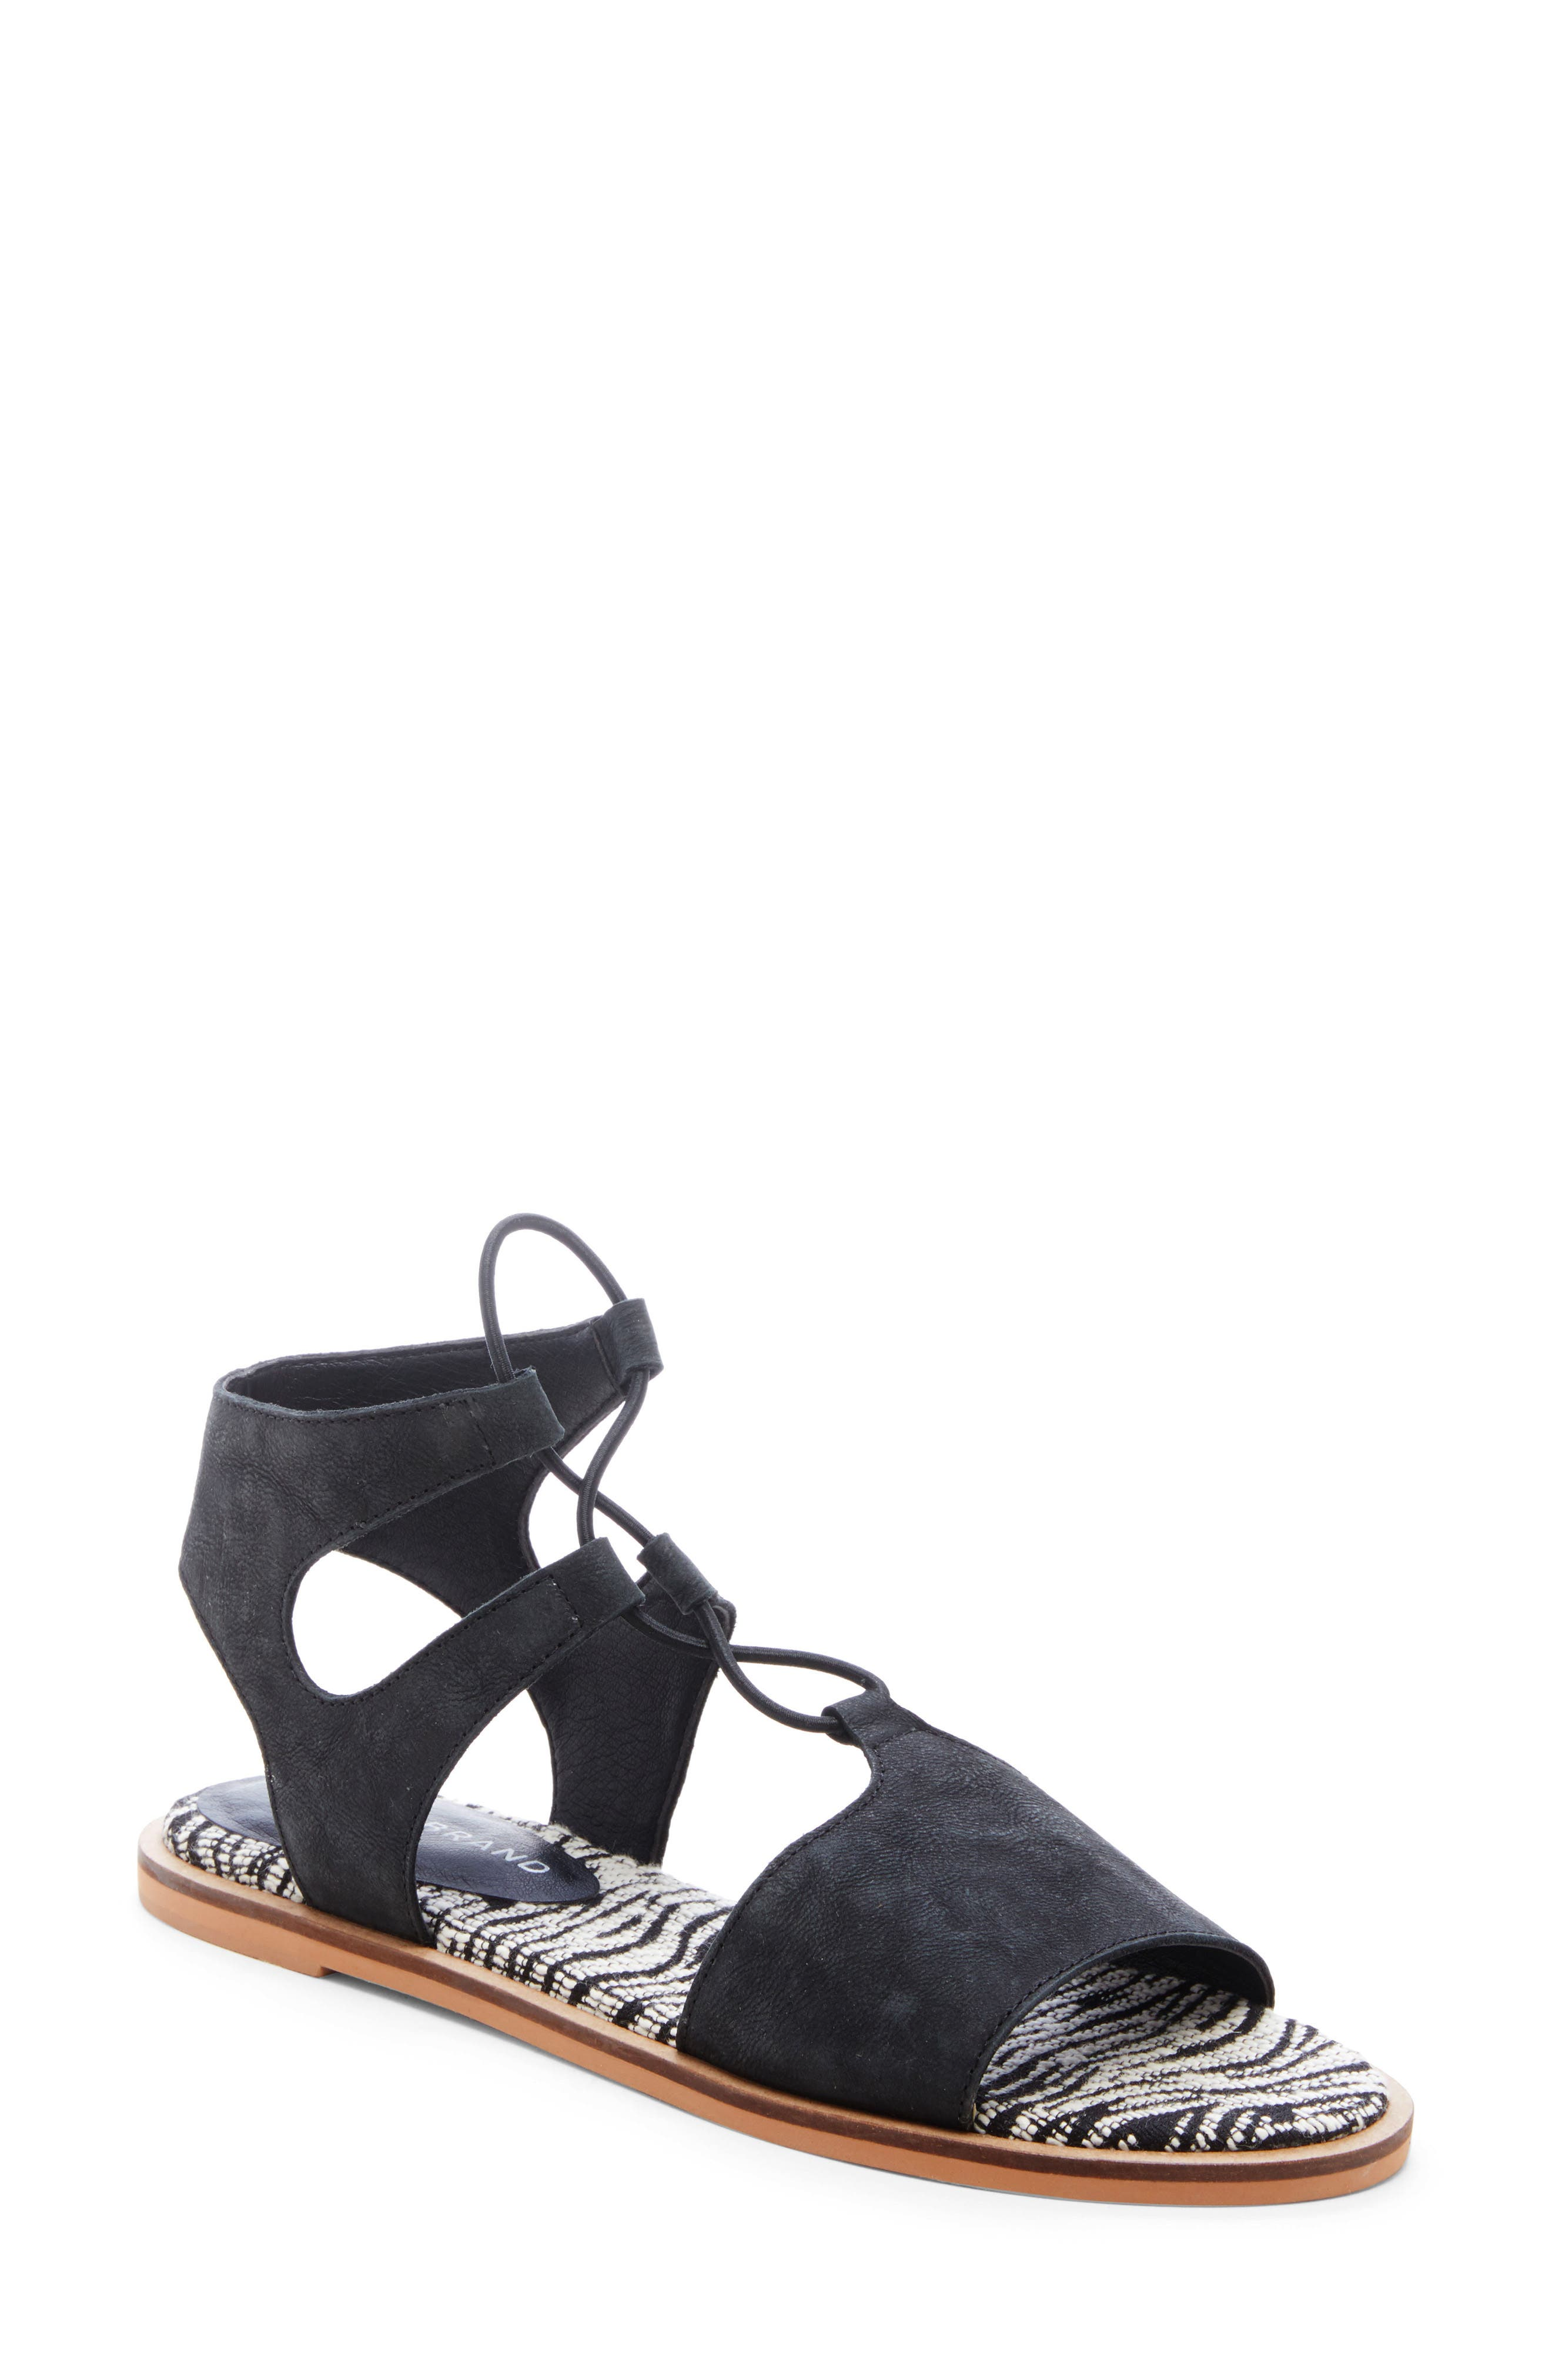 Lucky Brand Feray Gladiator Sandal, Black